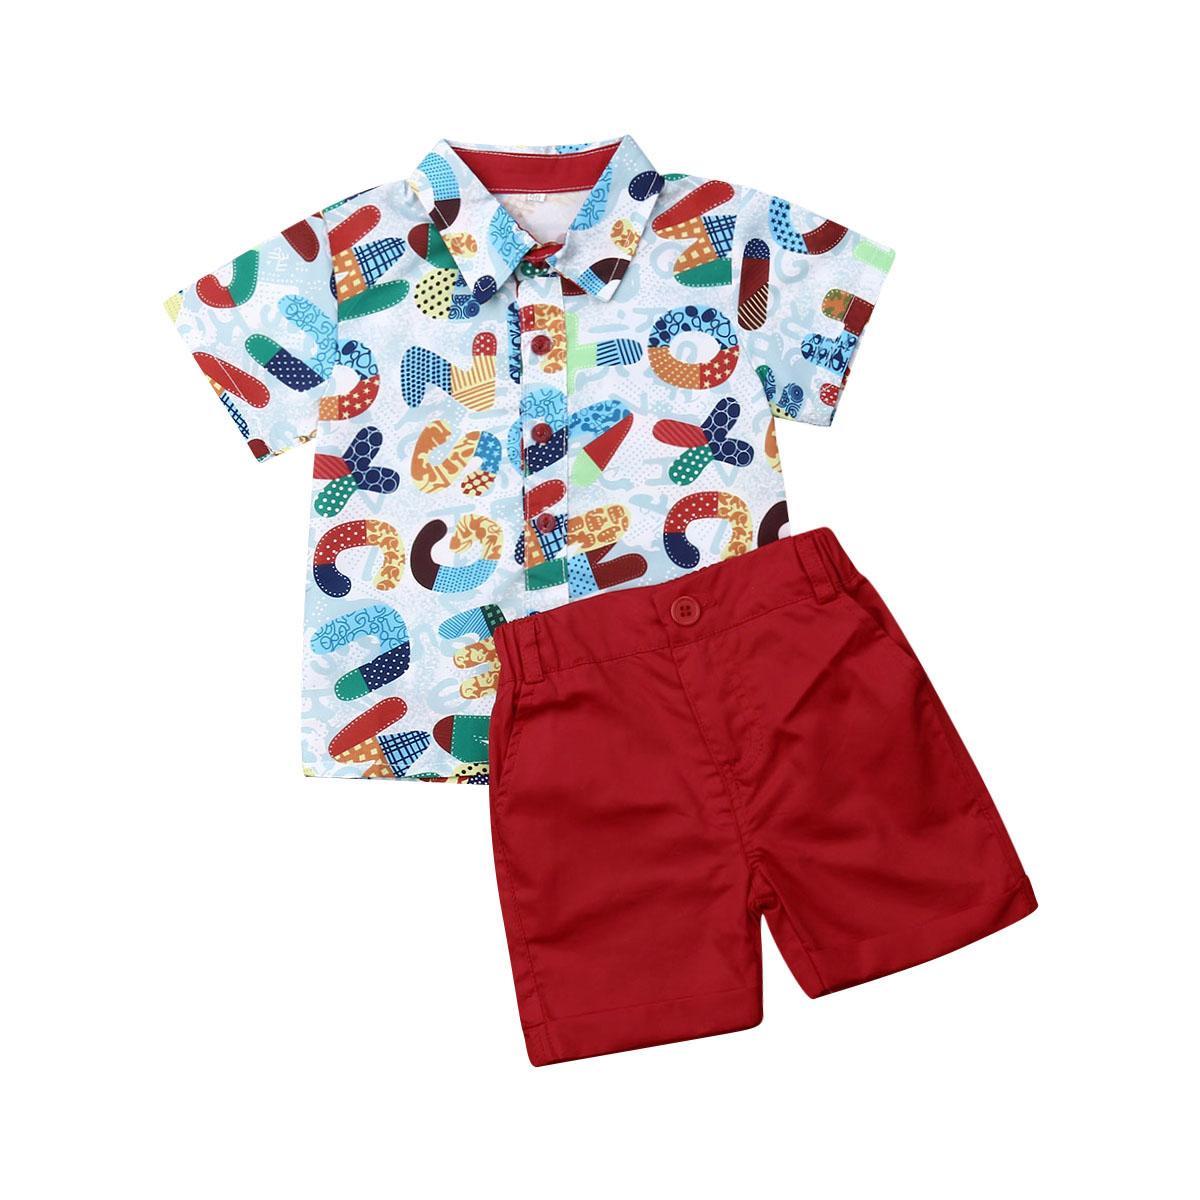 2019 Baby Summer Clothing Infant Boys Baby Kid Castle Print Tops Short Sleeve T shirt Shorts Pants Outfits Santa Clothes 1-6T